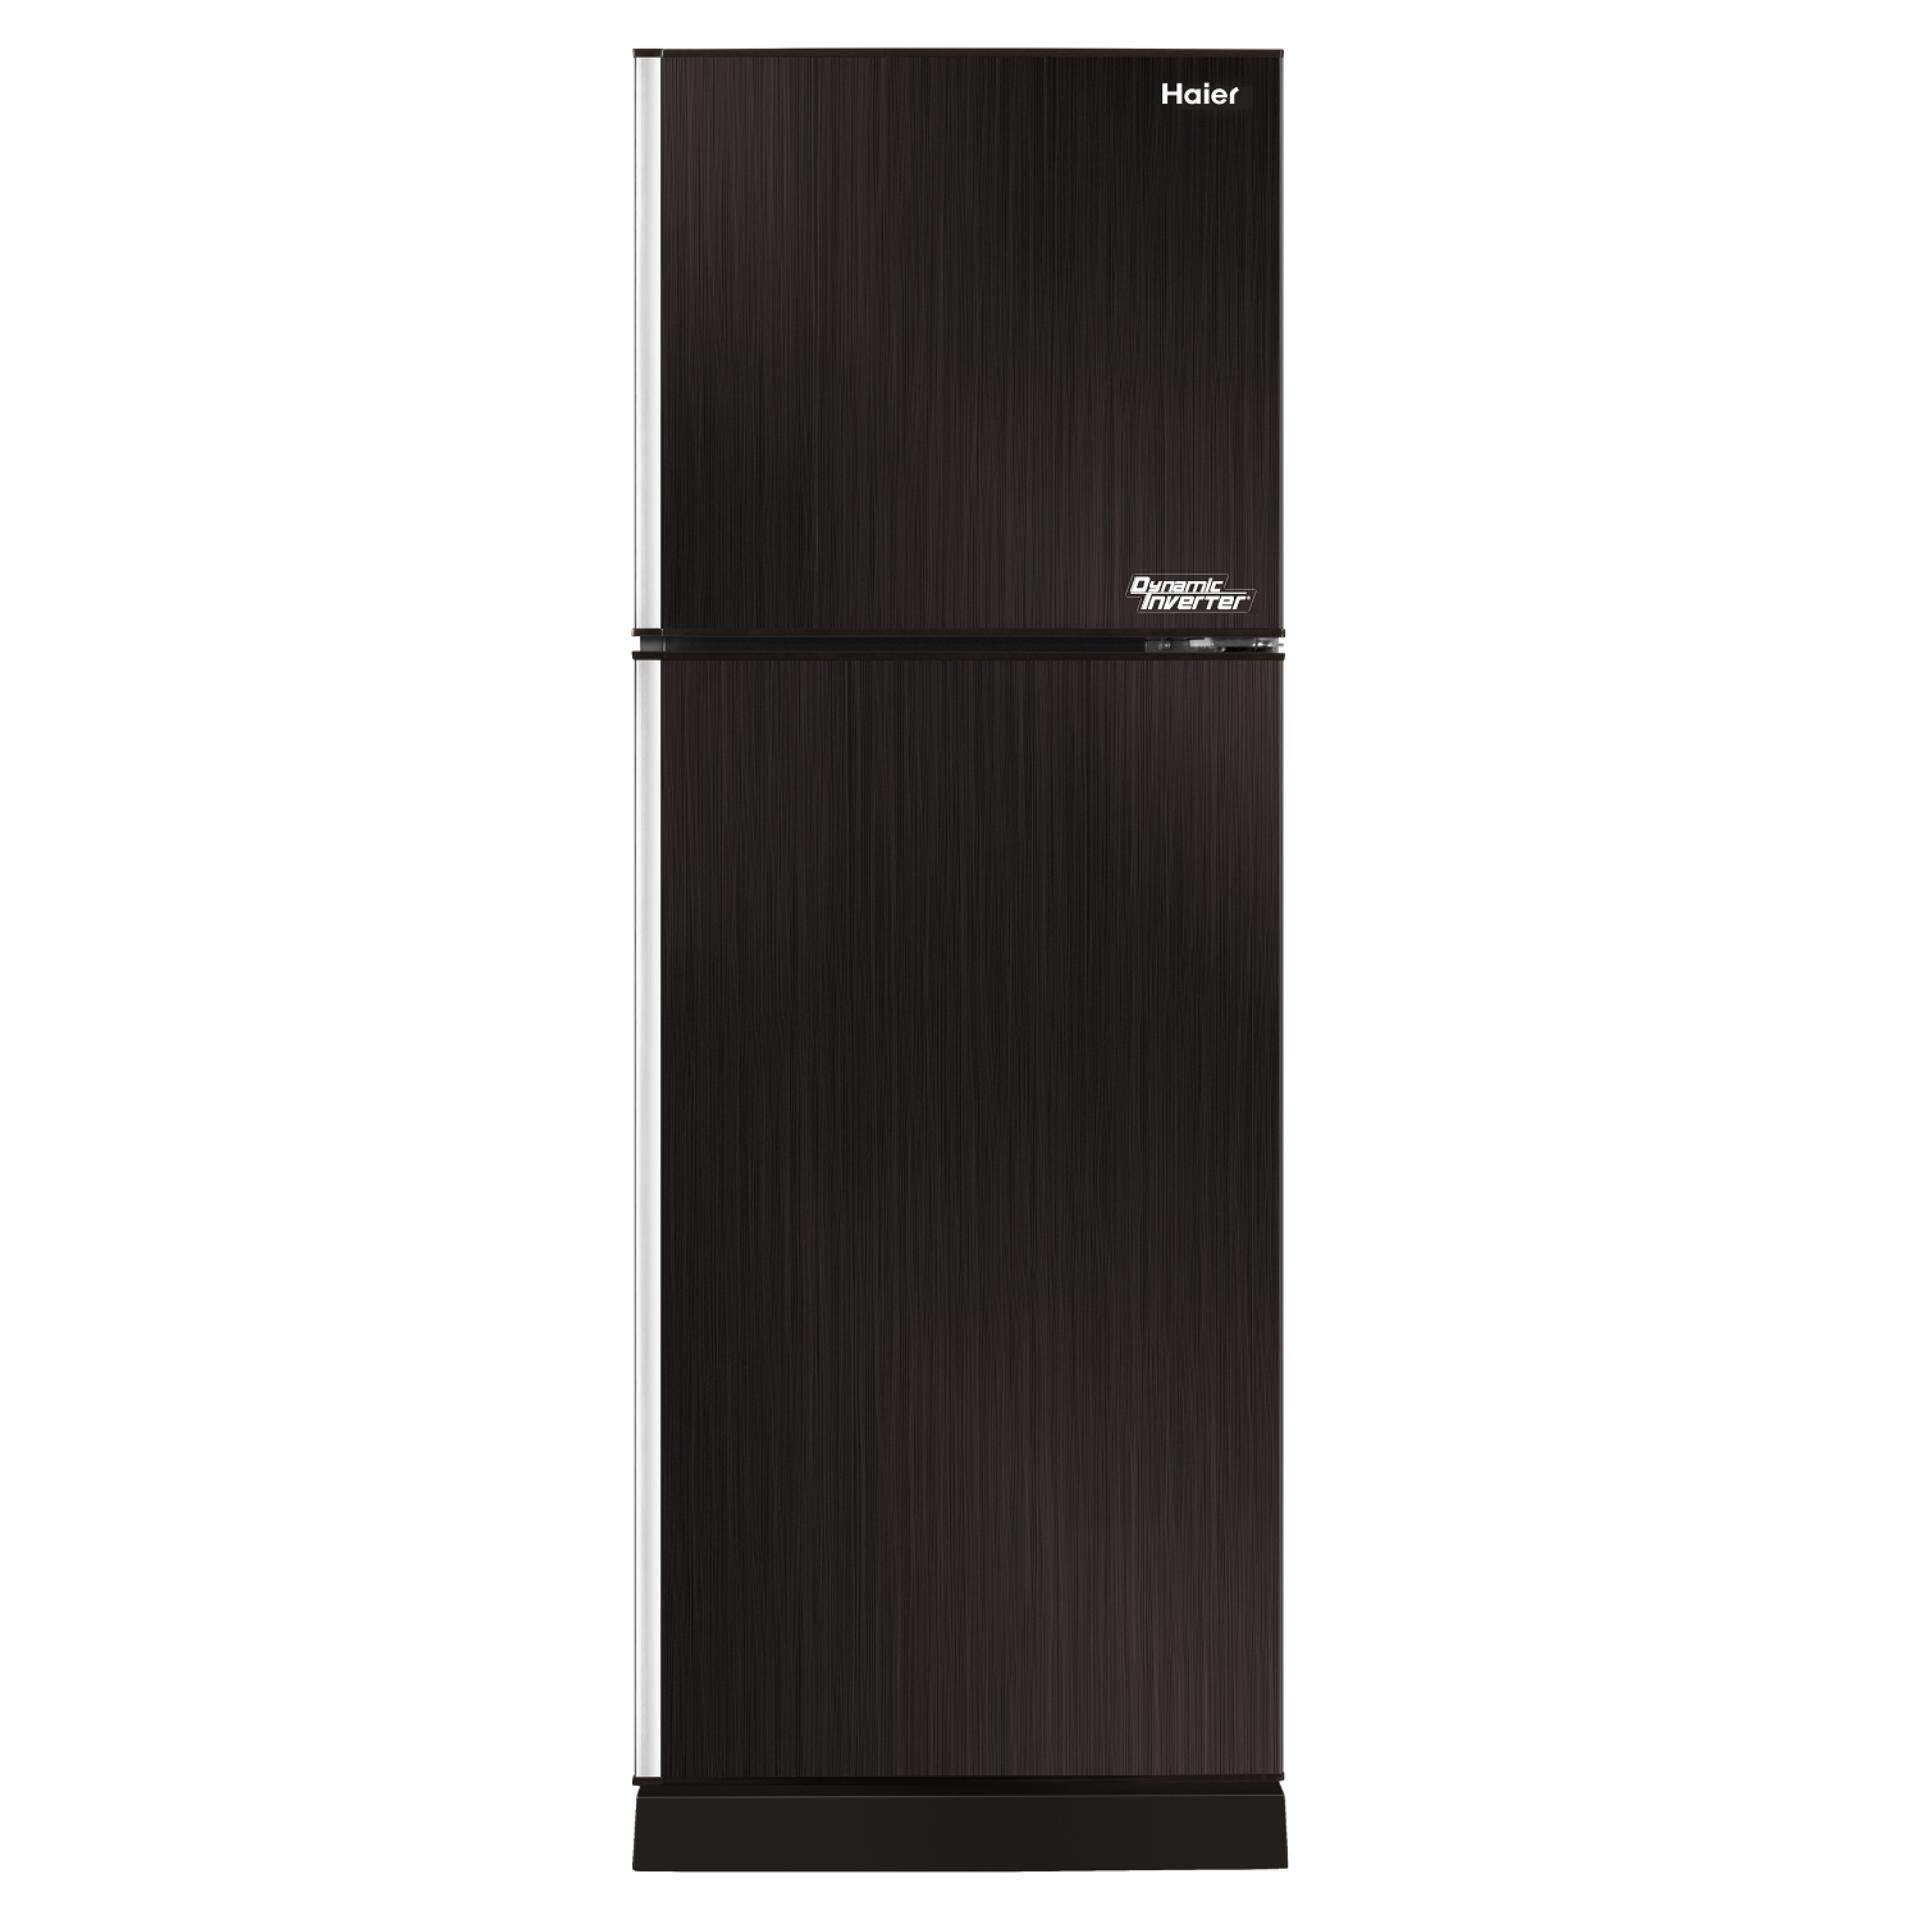 Haier ตู้เย็น 2 ประตู Dynamic Inverter รุ่น Hrf Tmv227 Mb ขนาด 7 2 คิว 225 ลิตร สมุทรปราการ